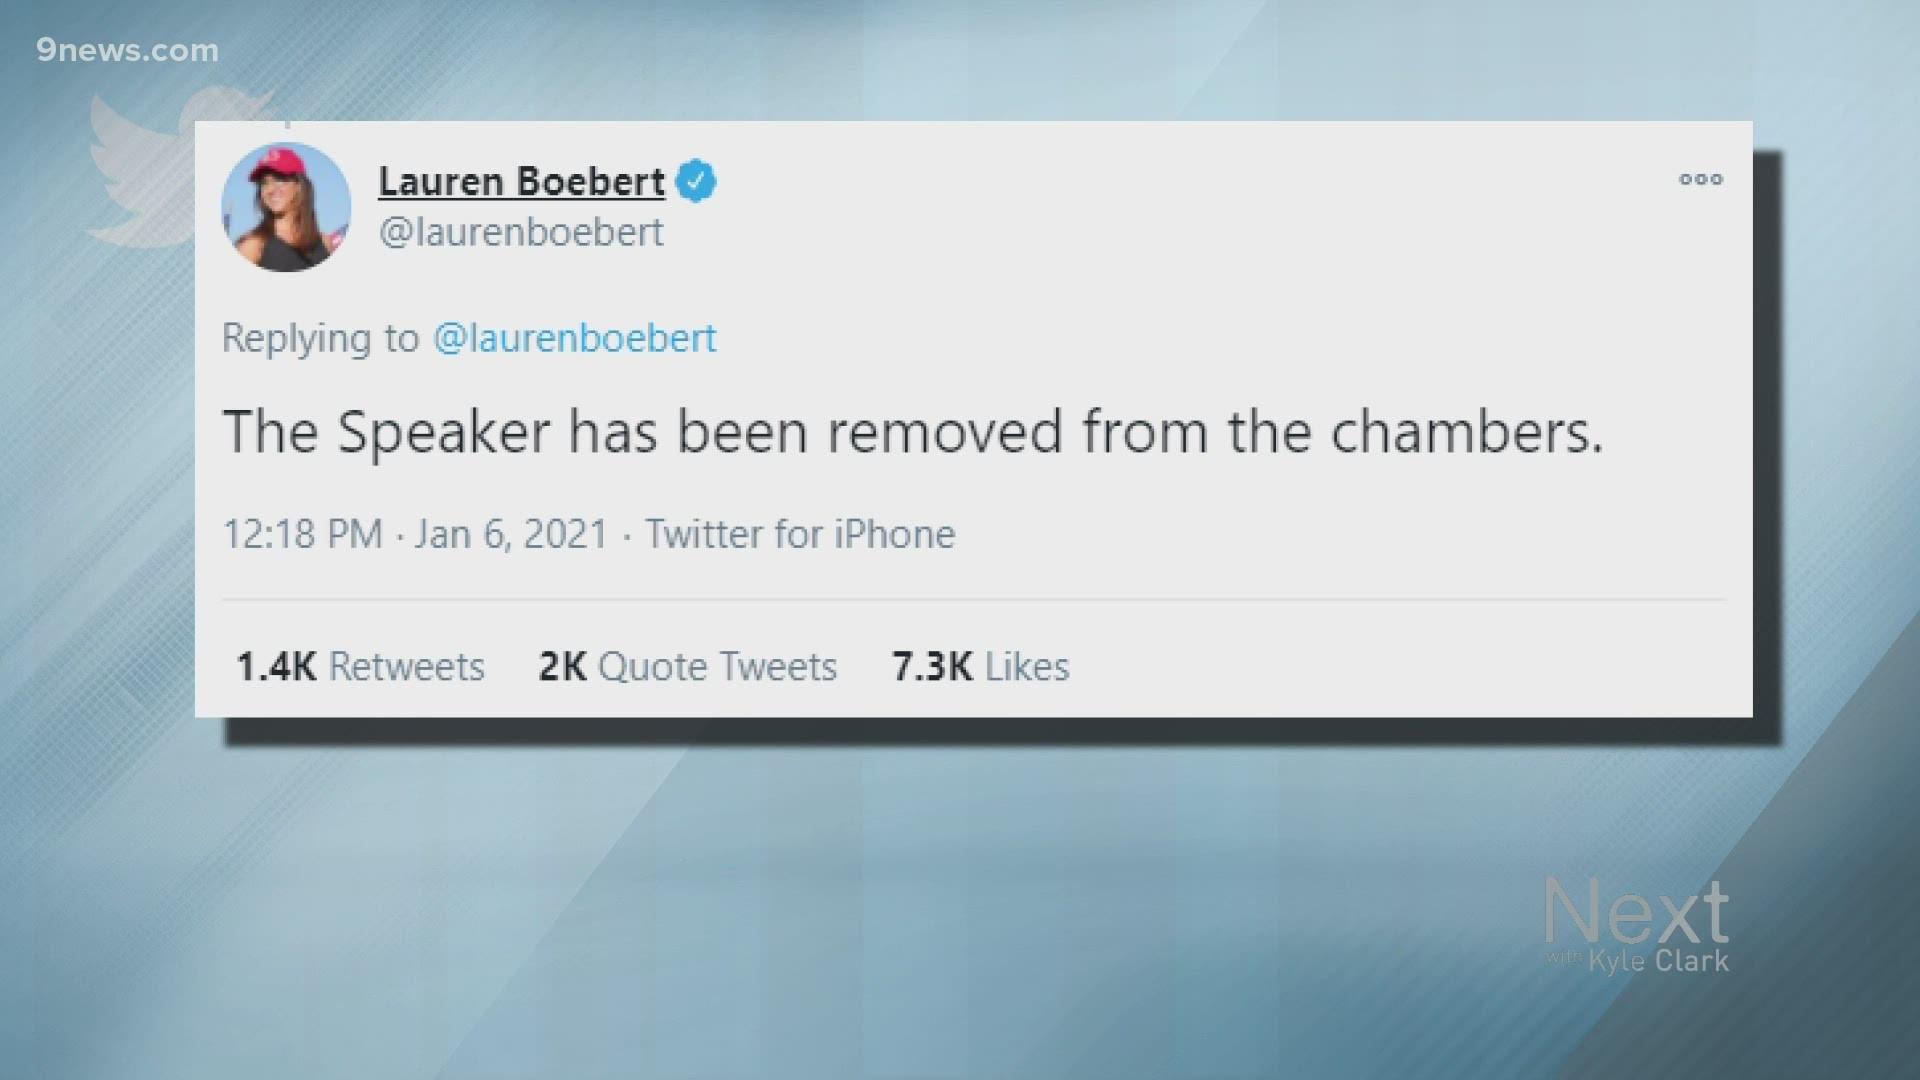 Facing calls to resign, Boebert shifts blame to Democrats, Hollywood    9news.com